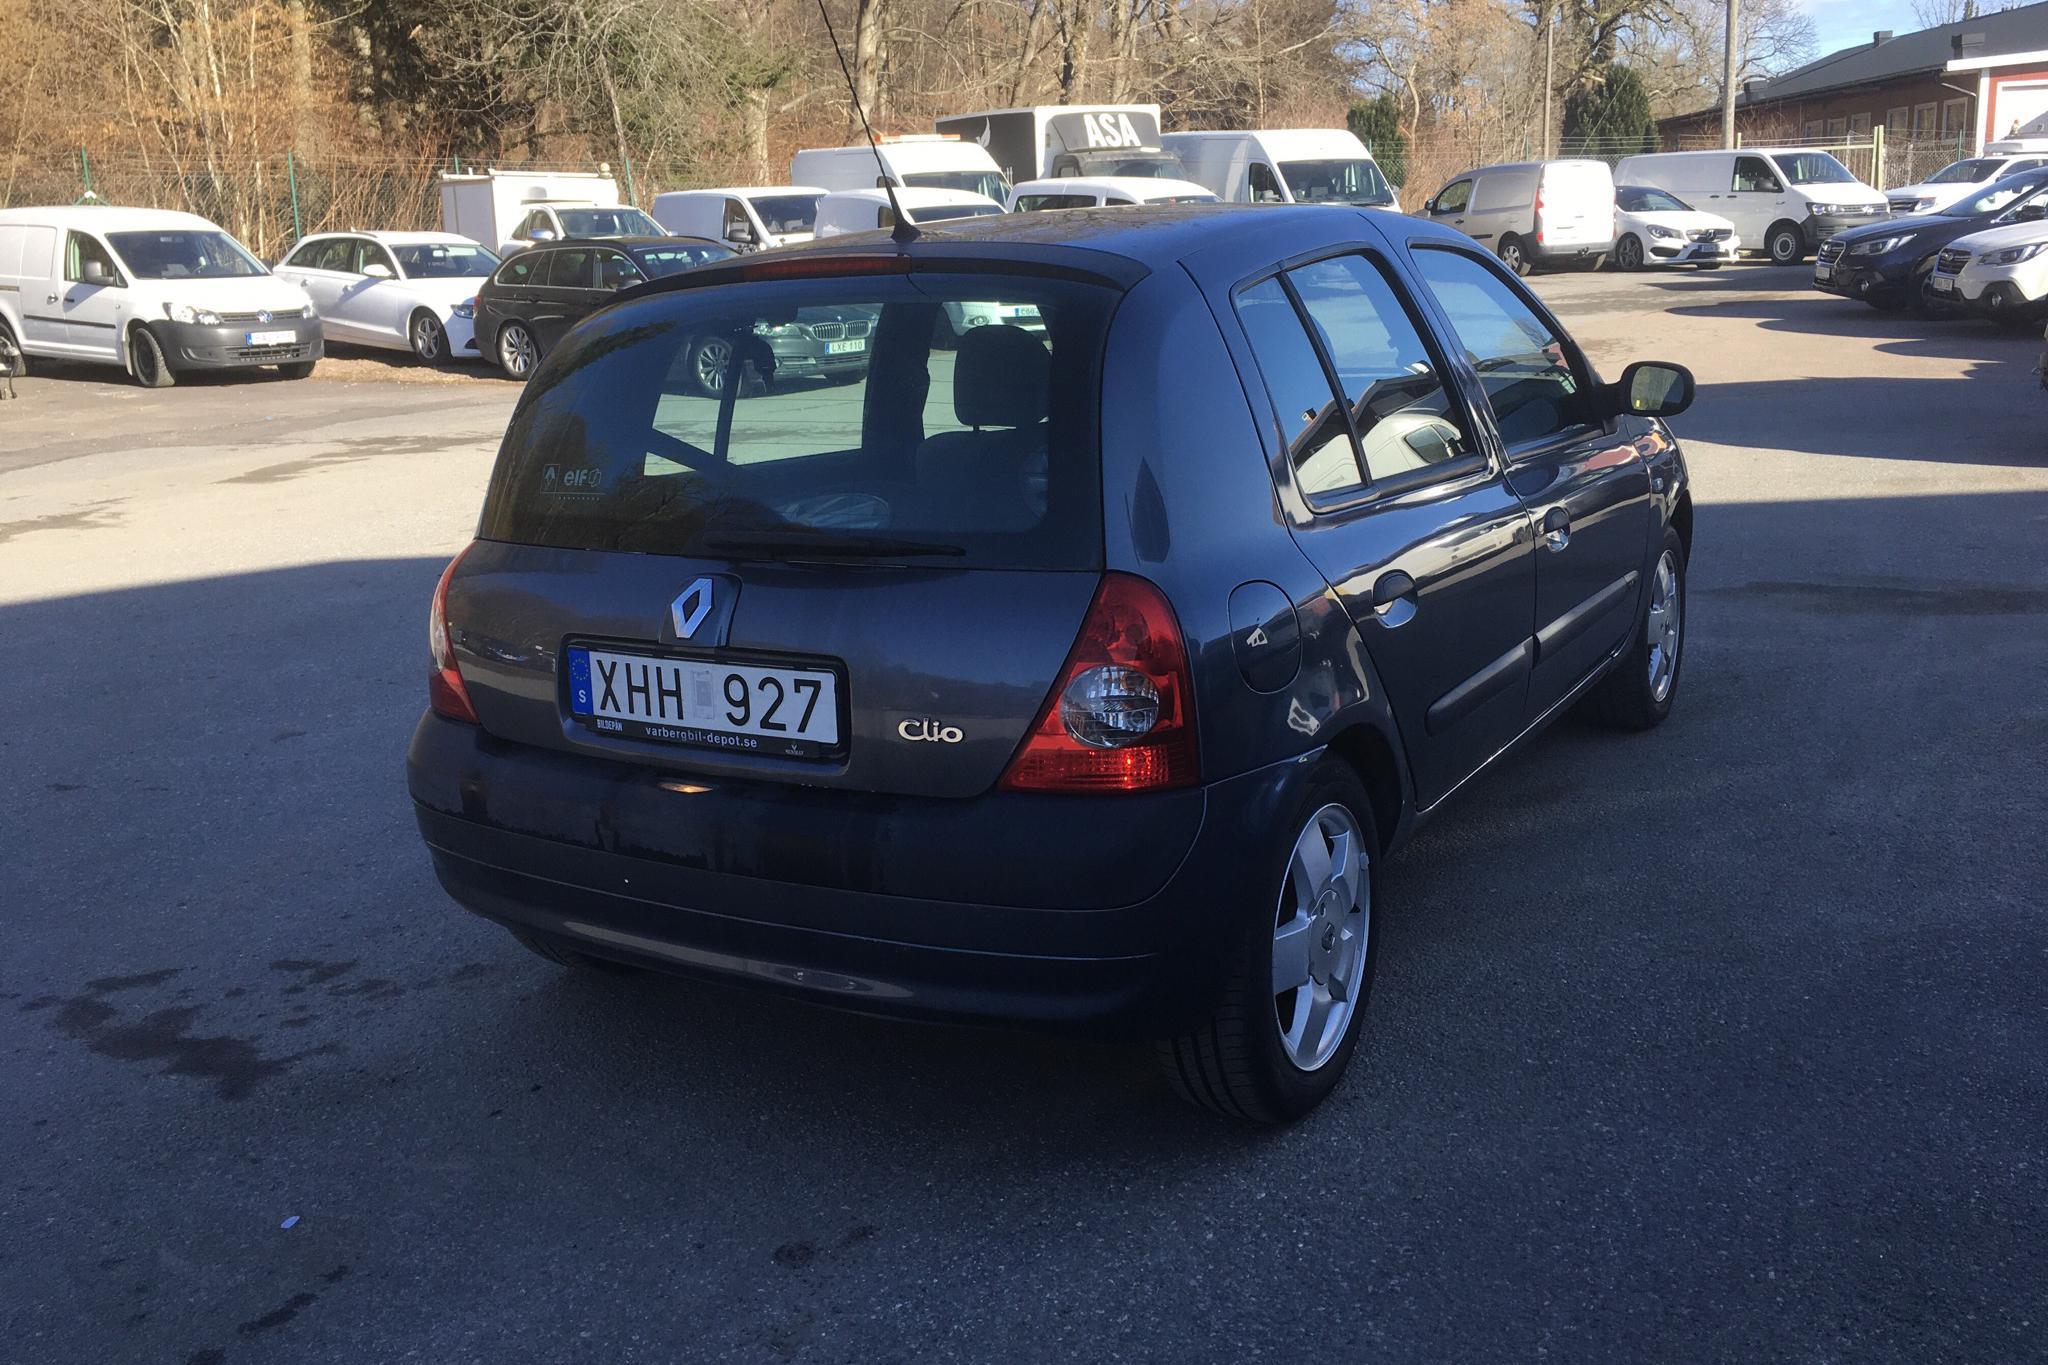 Renault Clio II 1.2 16v 5dr (75hk) - 172 320 km - Manual - blue - 2006